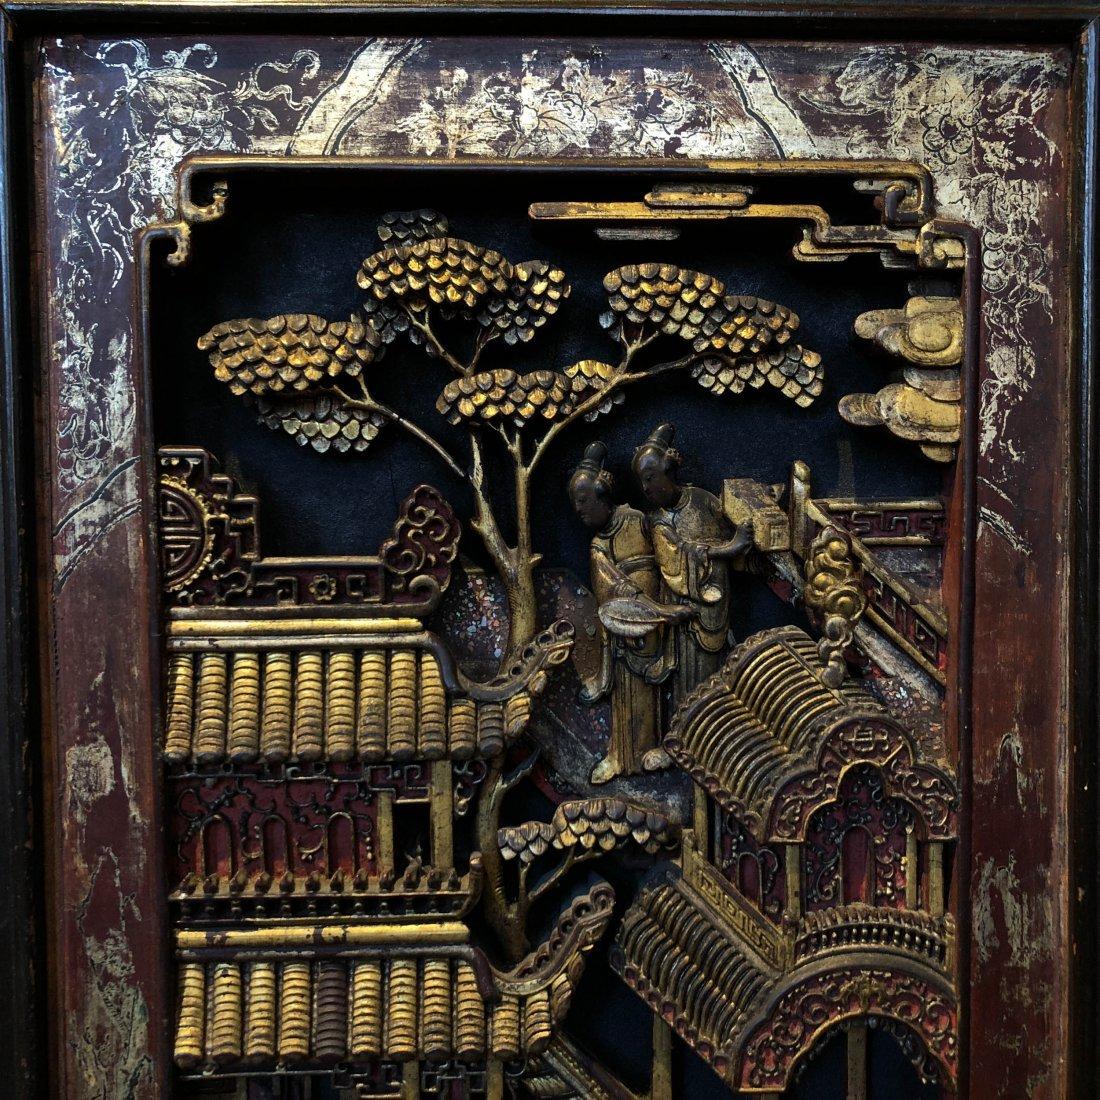 Antique Chinese Gilt & Hardwood Carved Cabinet - 9